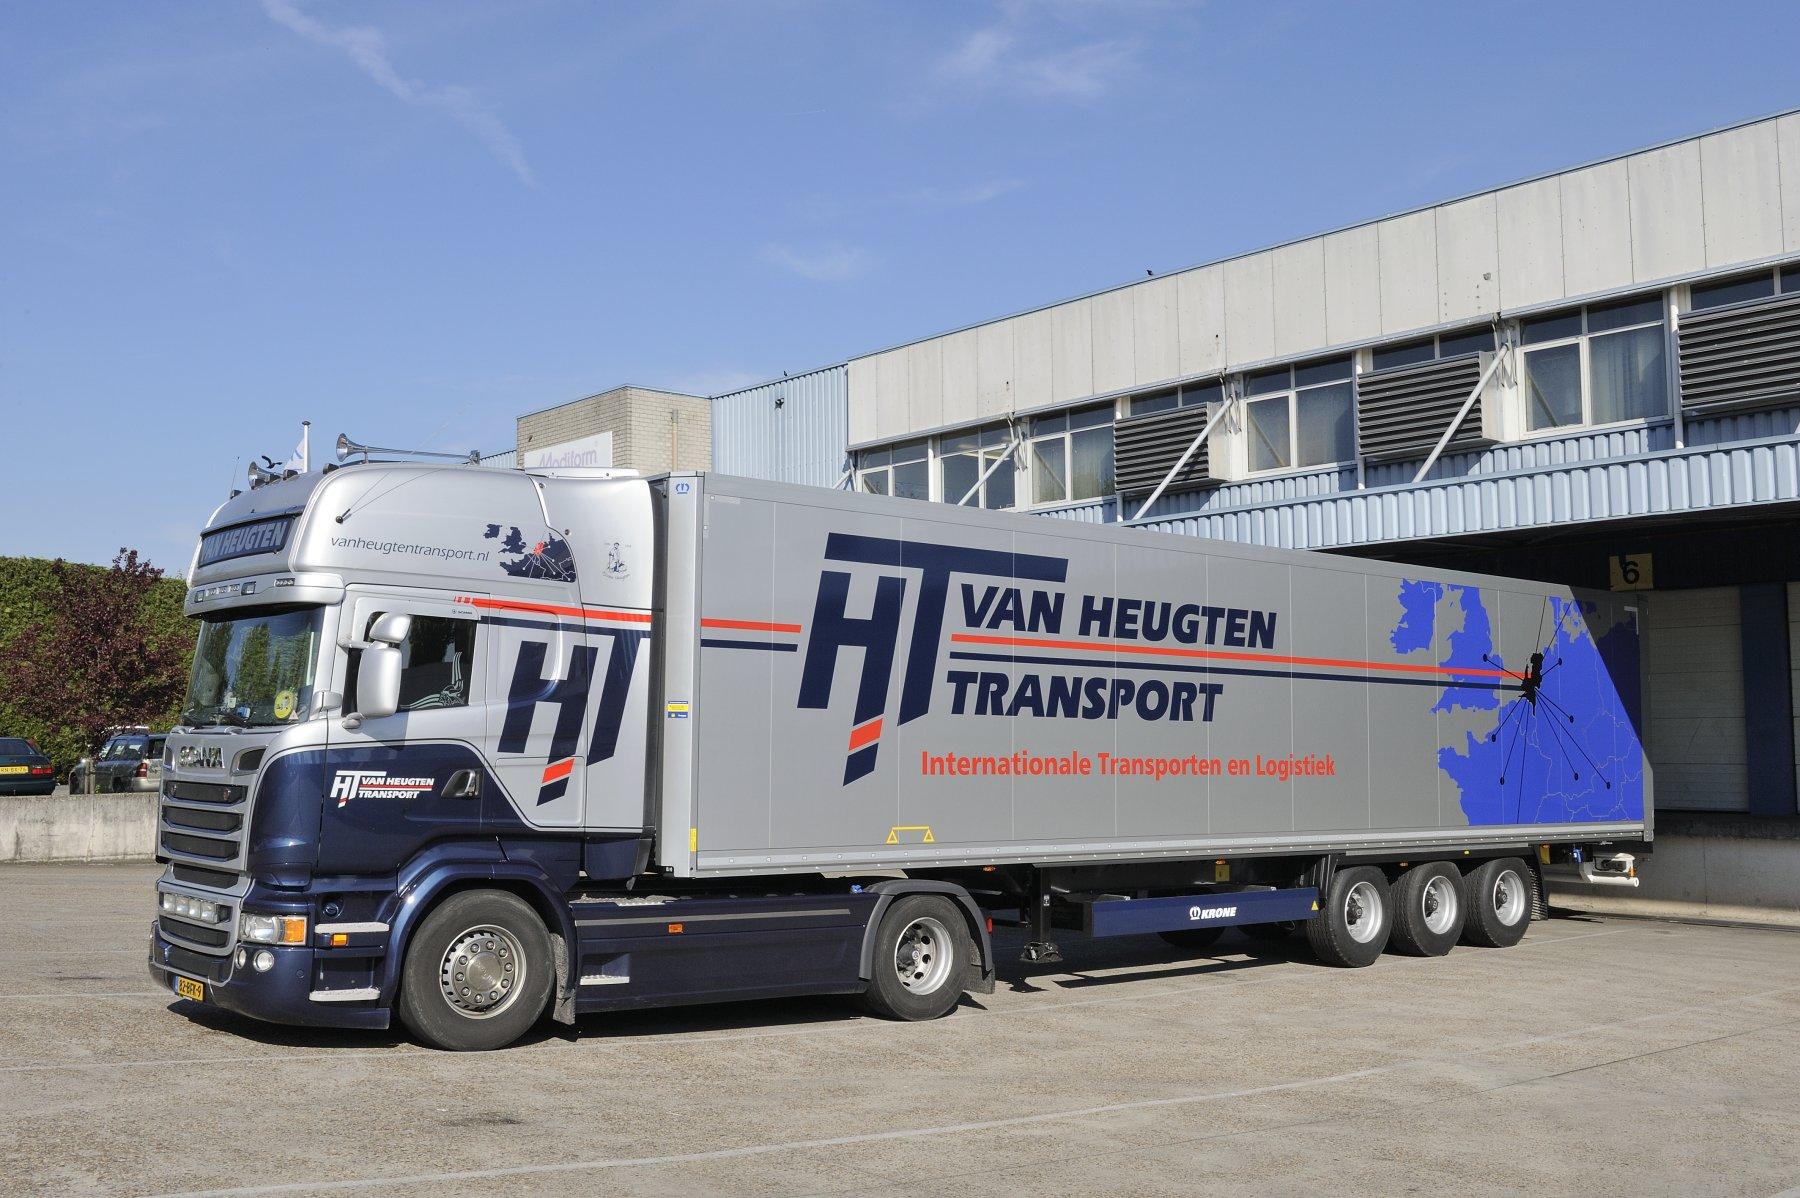 van-heugten-transport-01.jpg: www.vanheugtentransport.nl/site/transport-engeland